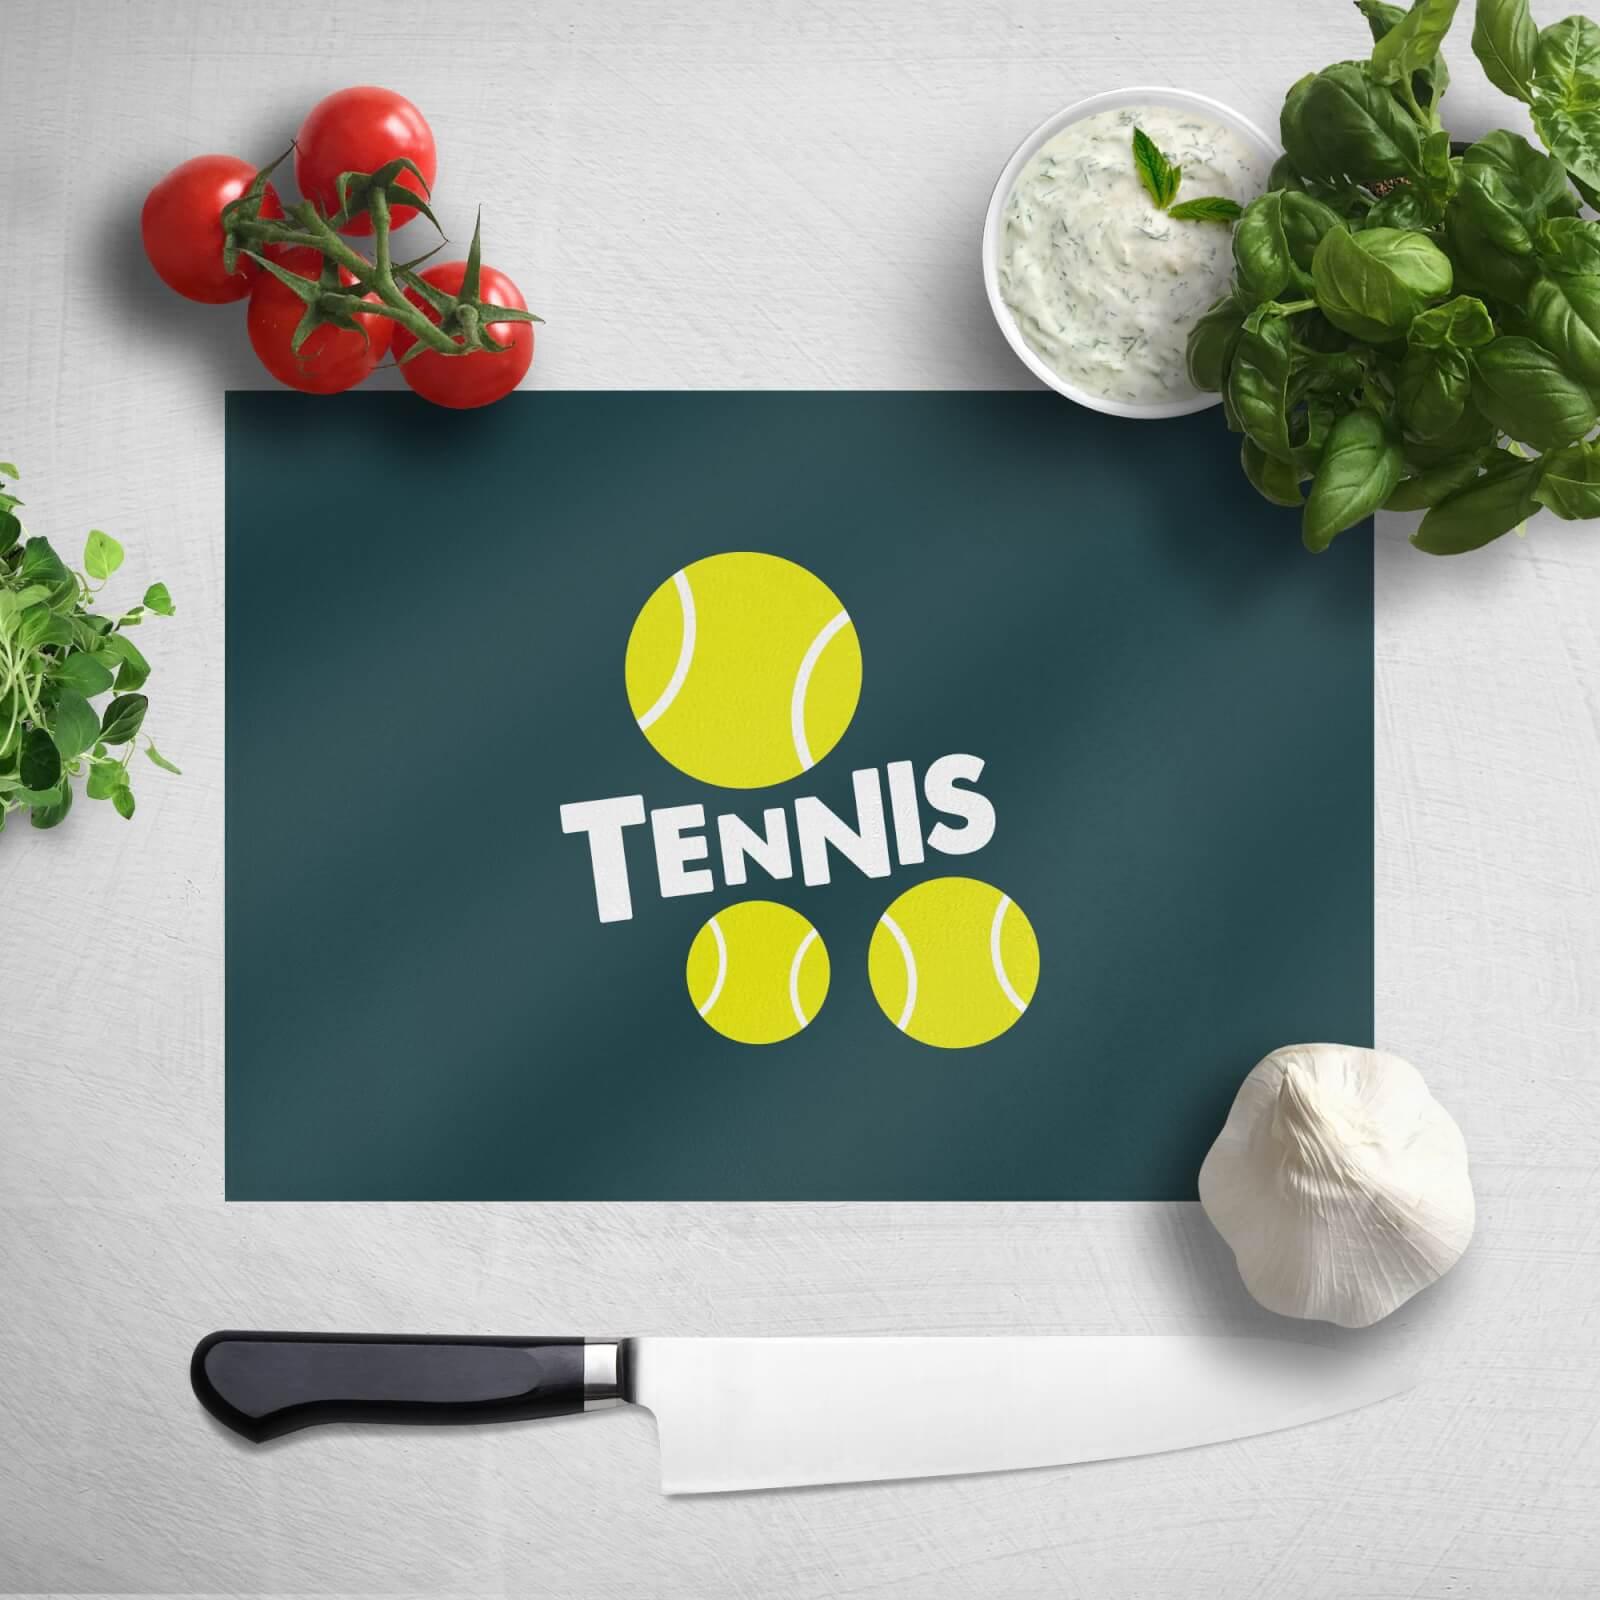 Tennis Balls Chopping Board